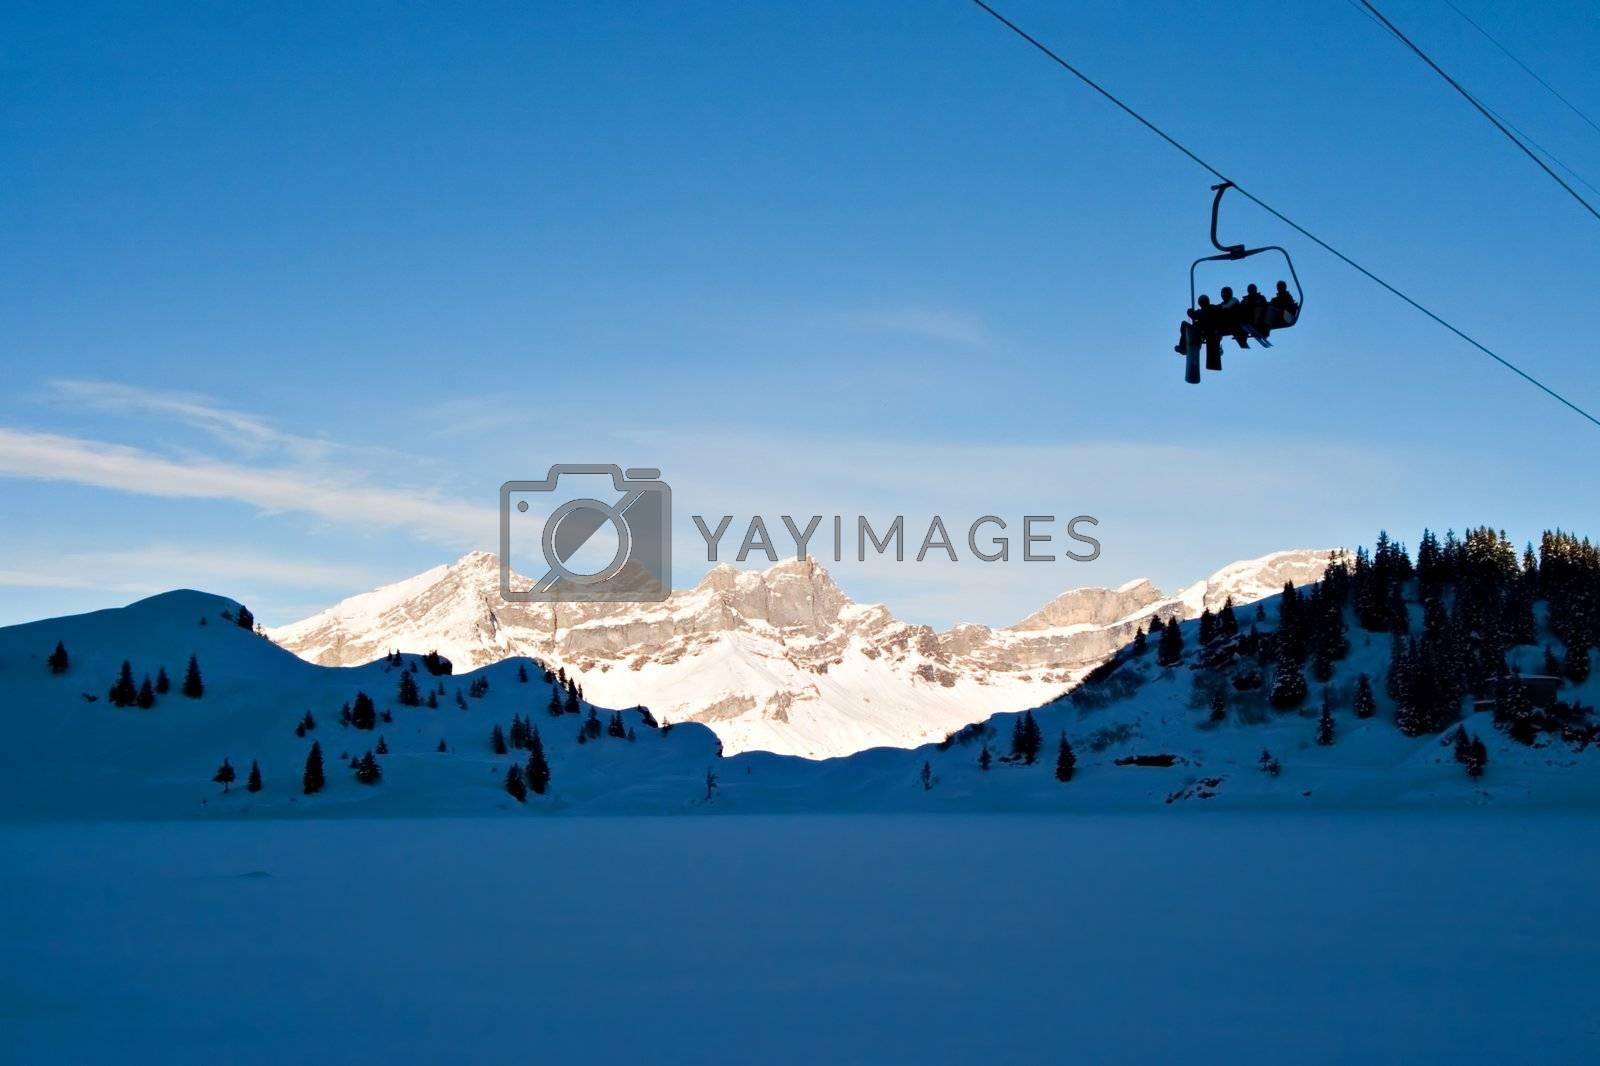 Skiers on Ski Lift, on the Swiss Alps.